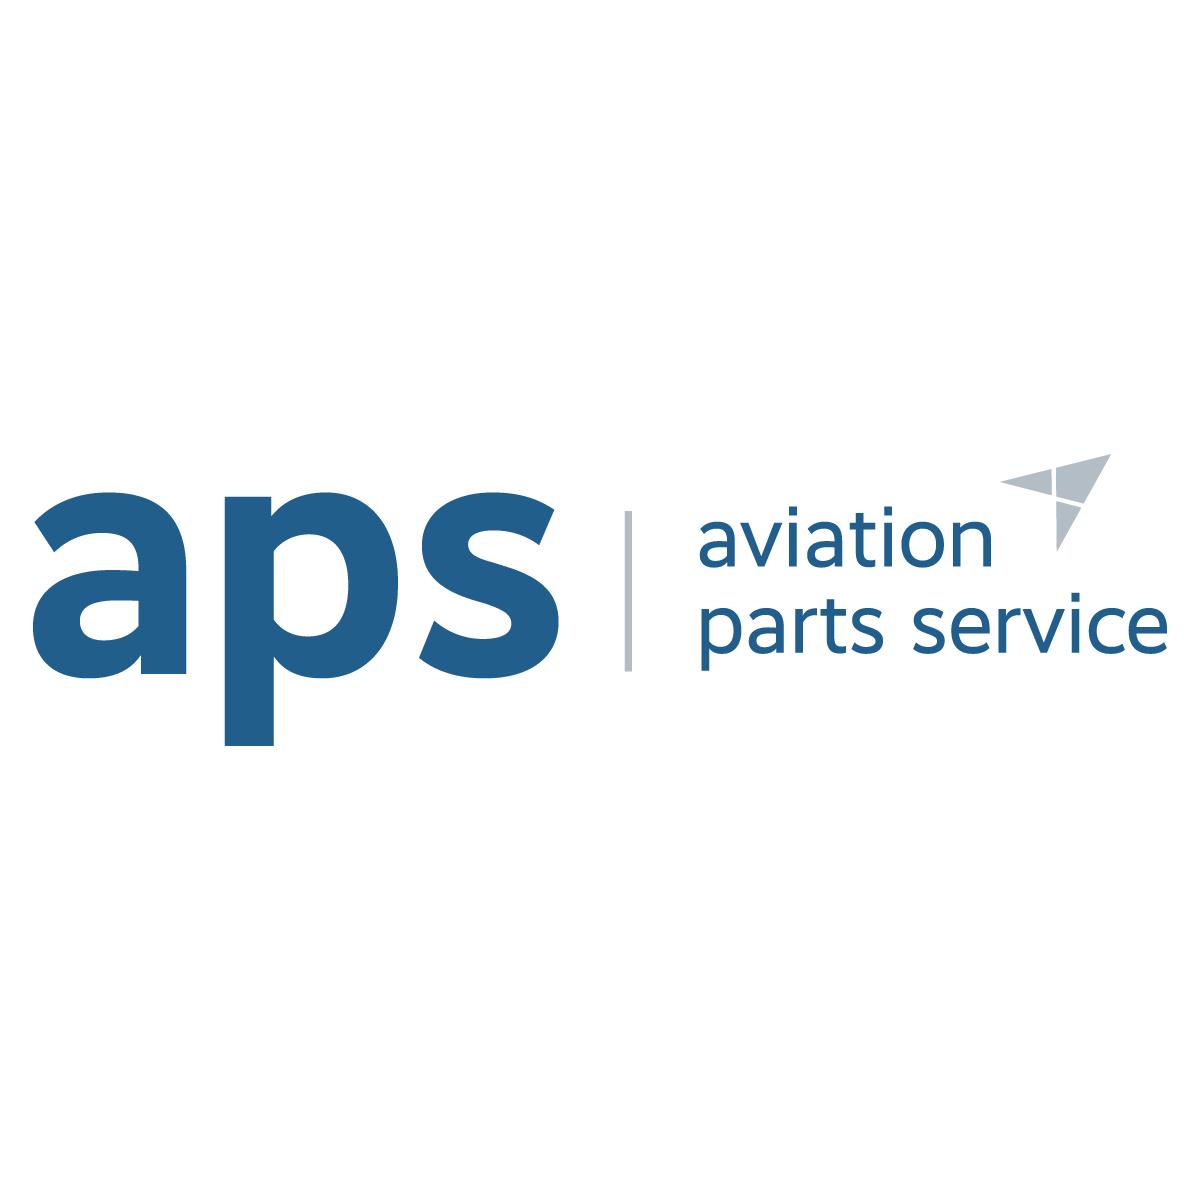 APS Aviation Parts Service doo